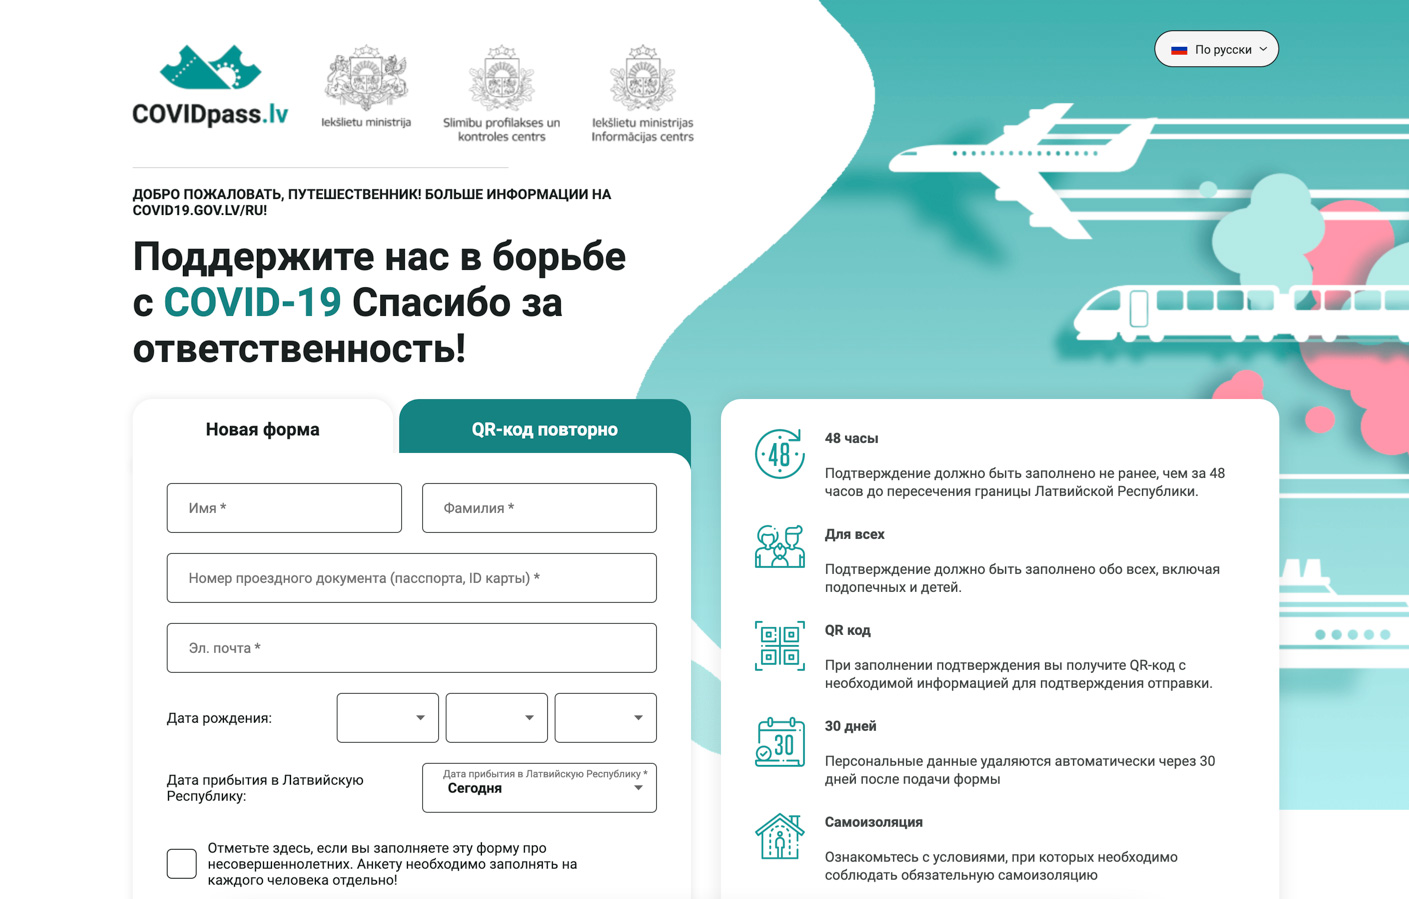 CovidPass.lv — нужен ли QR-код для въезда в Латвию?